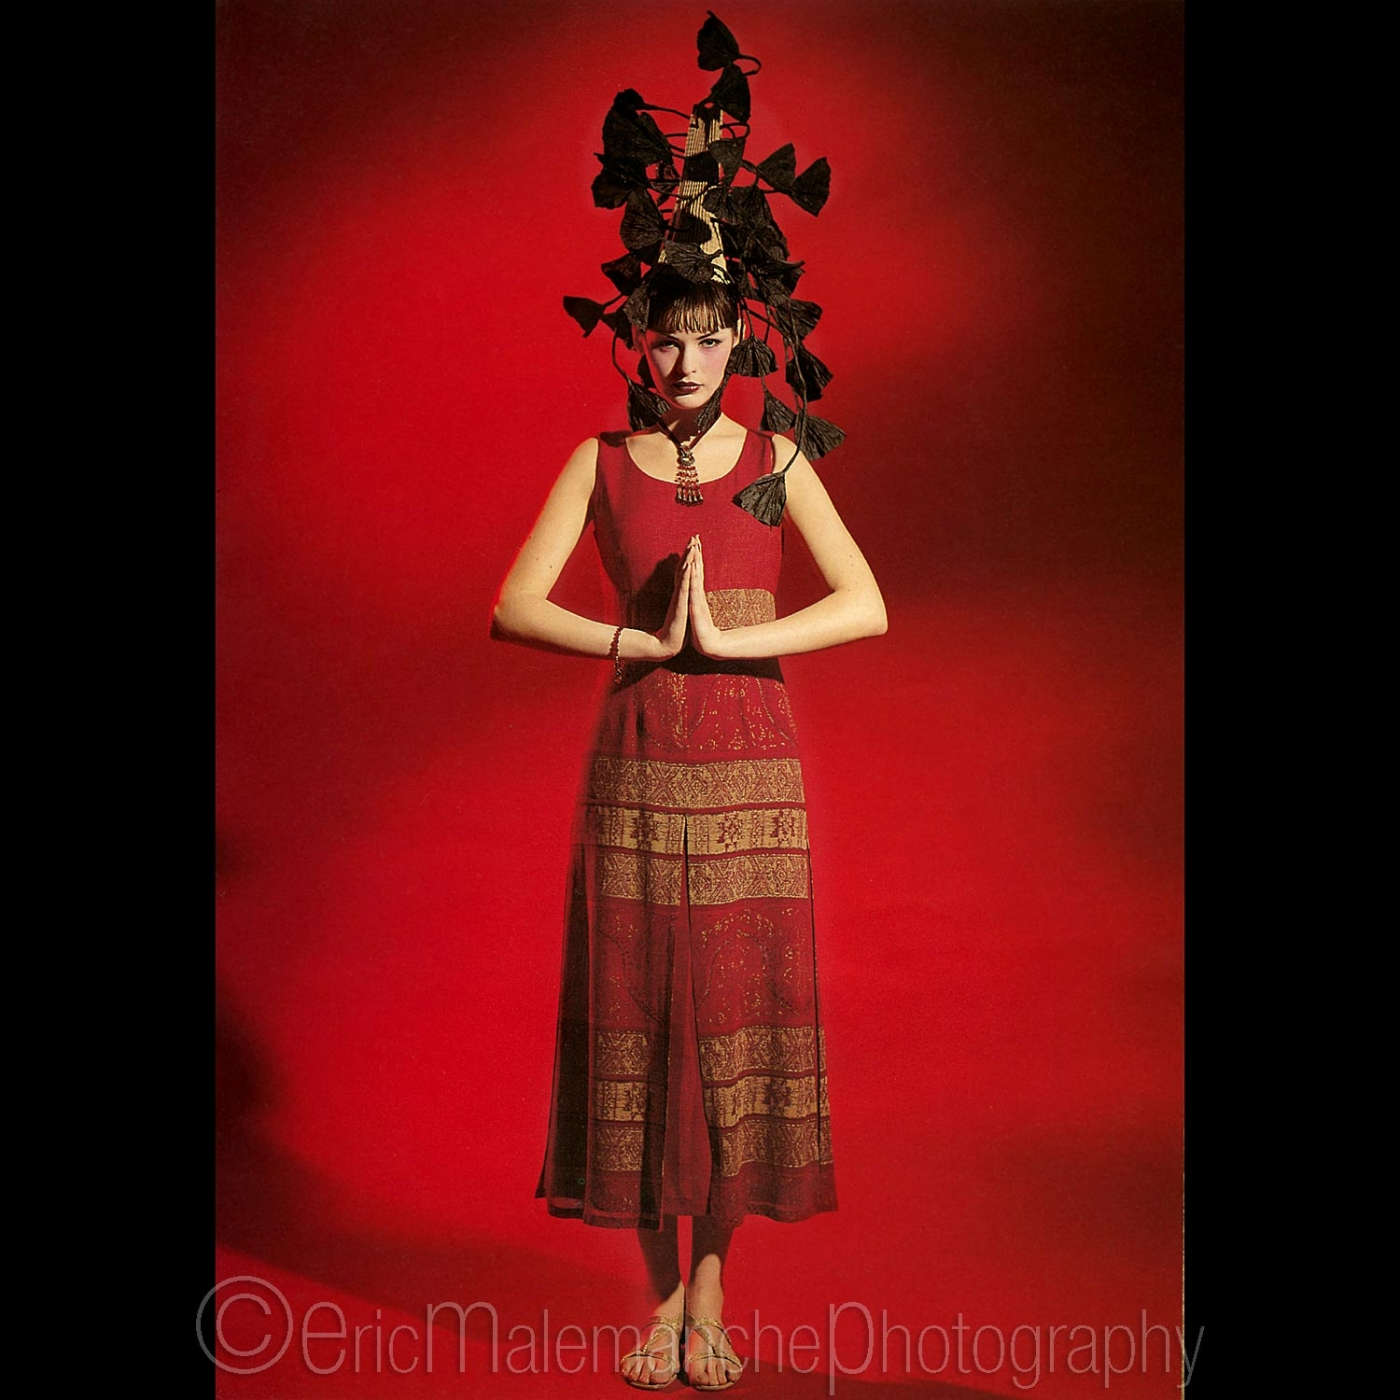 http://www.ericmalemanche.com/imagess/topics/fashion-90-s/liste/Fashion-Zapa-Japan-01.jpg